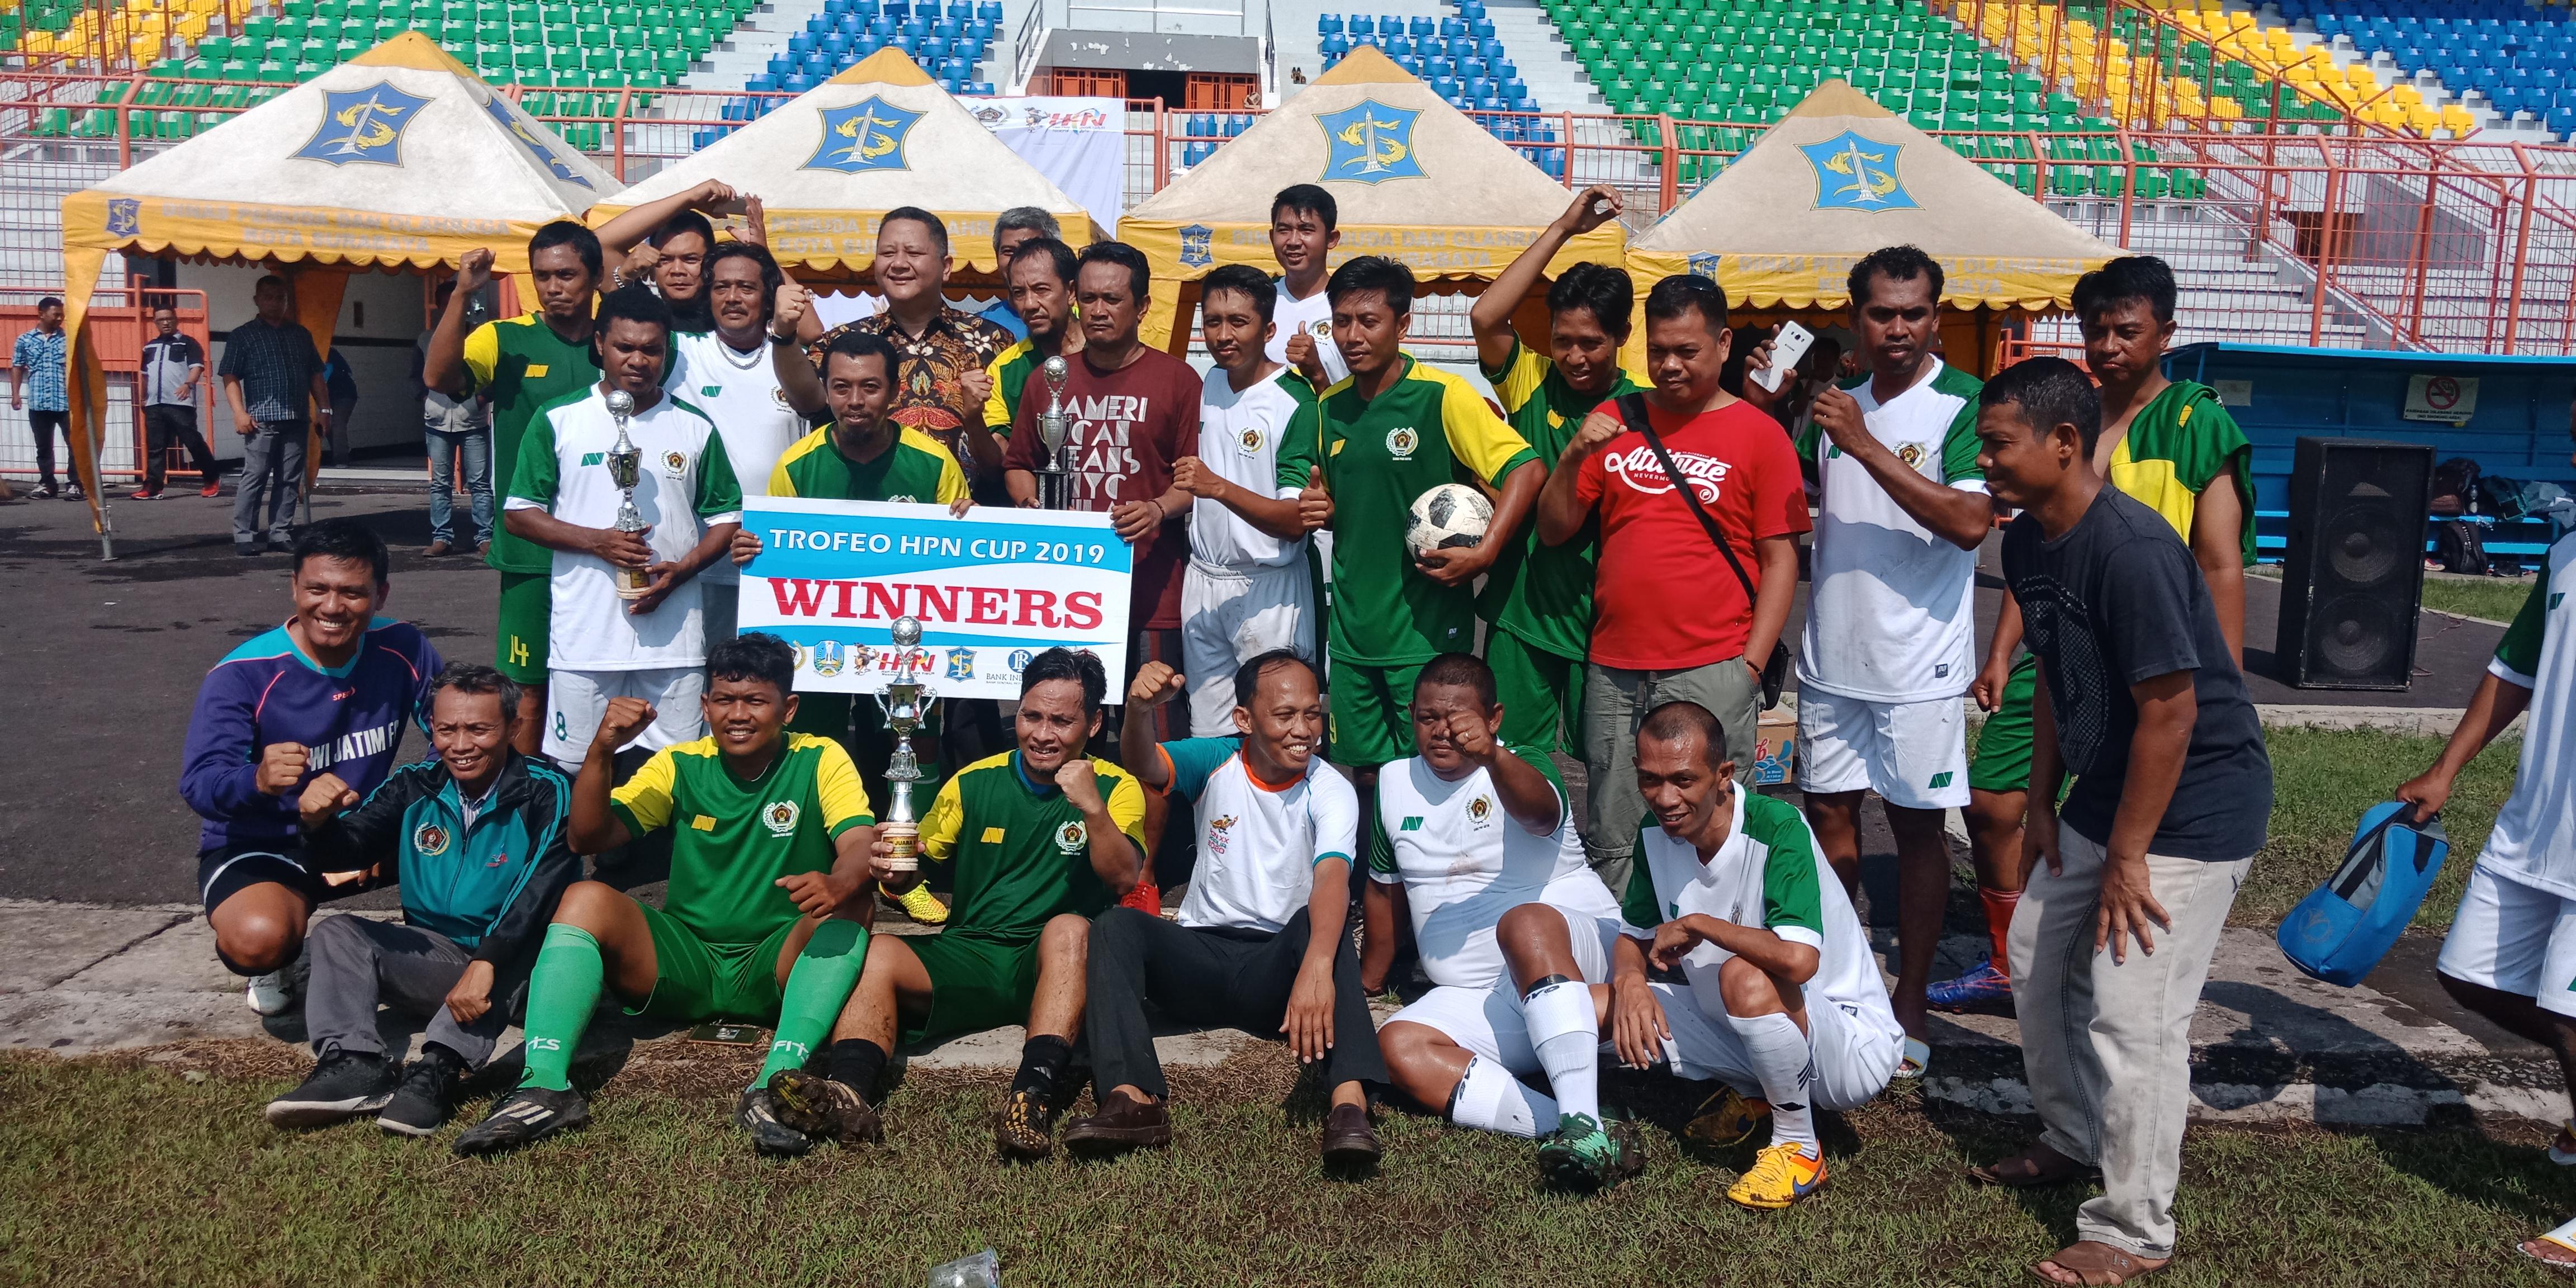 Wakil Wali Kota Surabaya Wisnu Sakti Buana saat menyerahkan Piala Trofeo Tim.